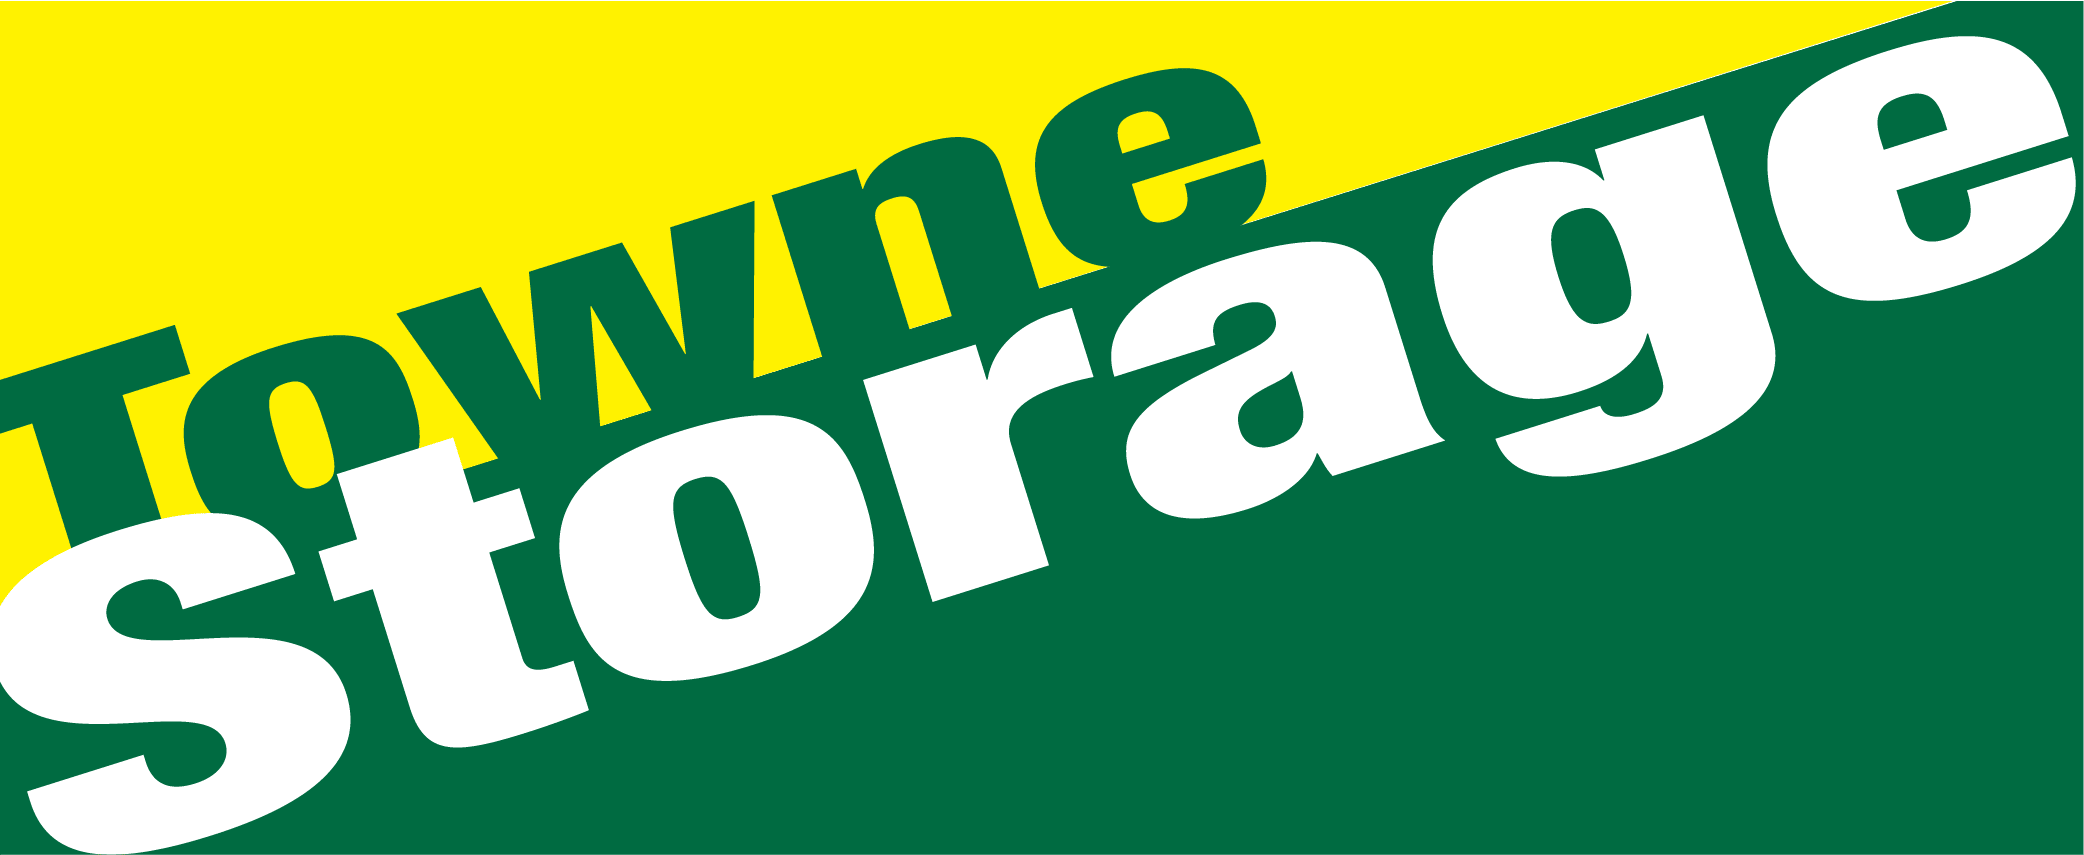 Towne Storage - Riverton 12600 logo